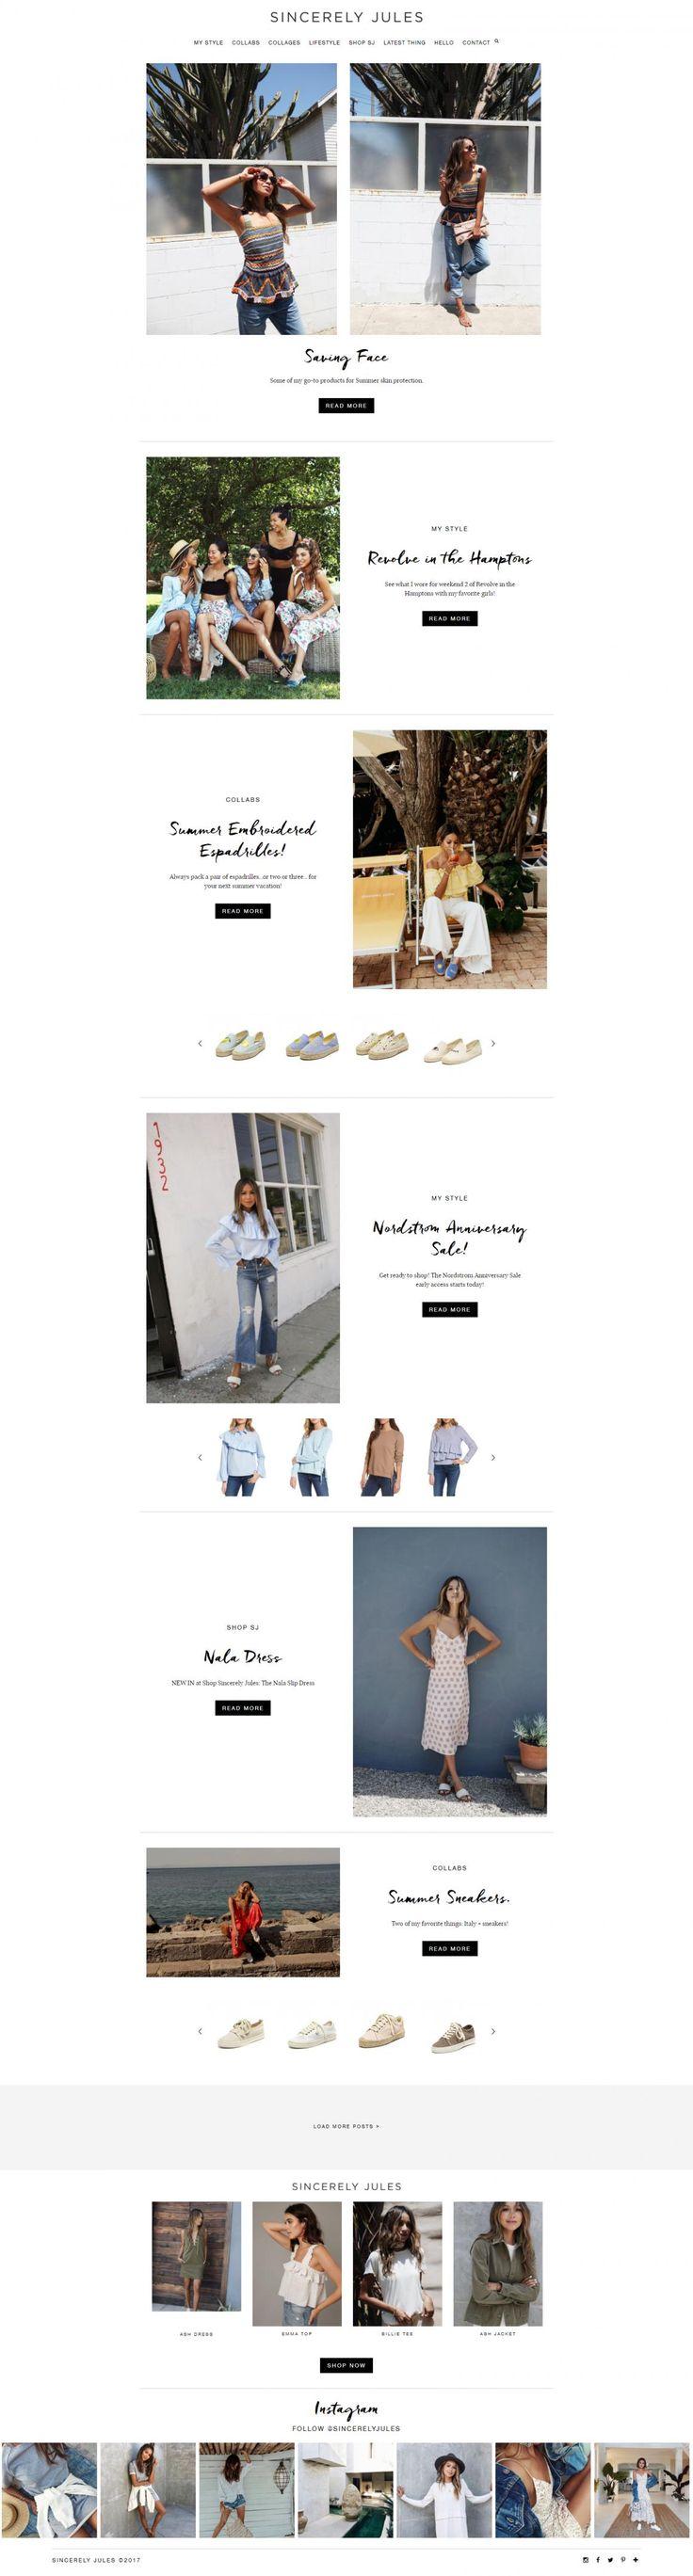 Best Design Blogs 36 best best web design blogs images on pinterest | dark, facebook